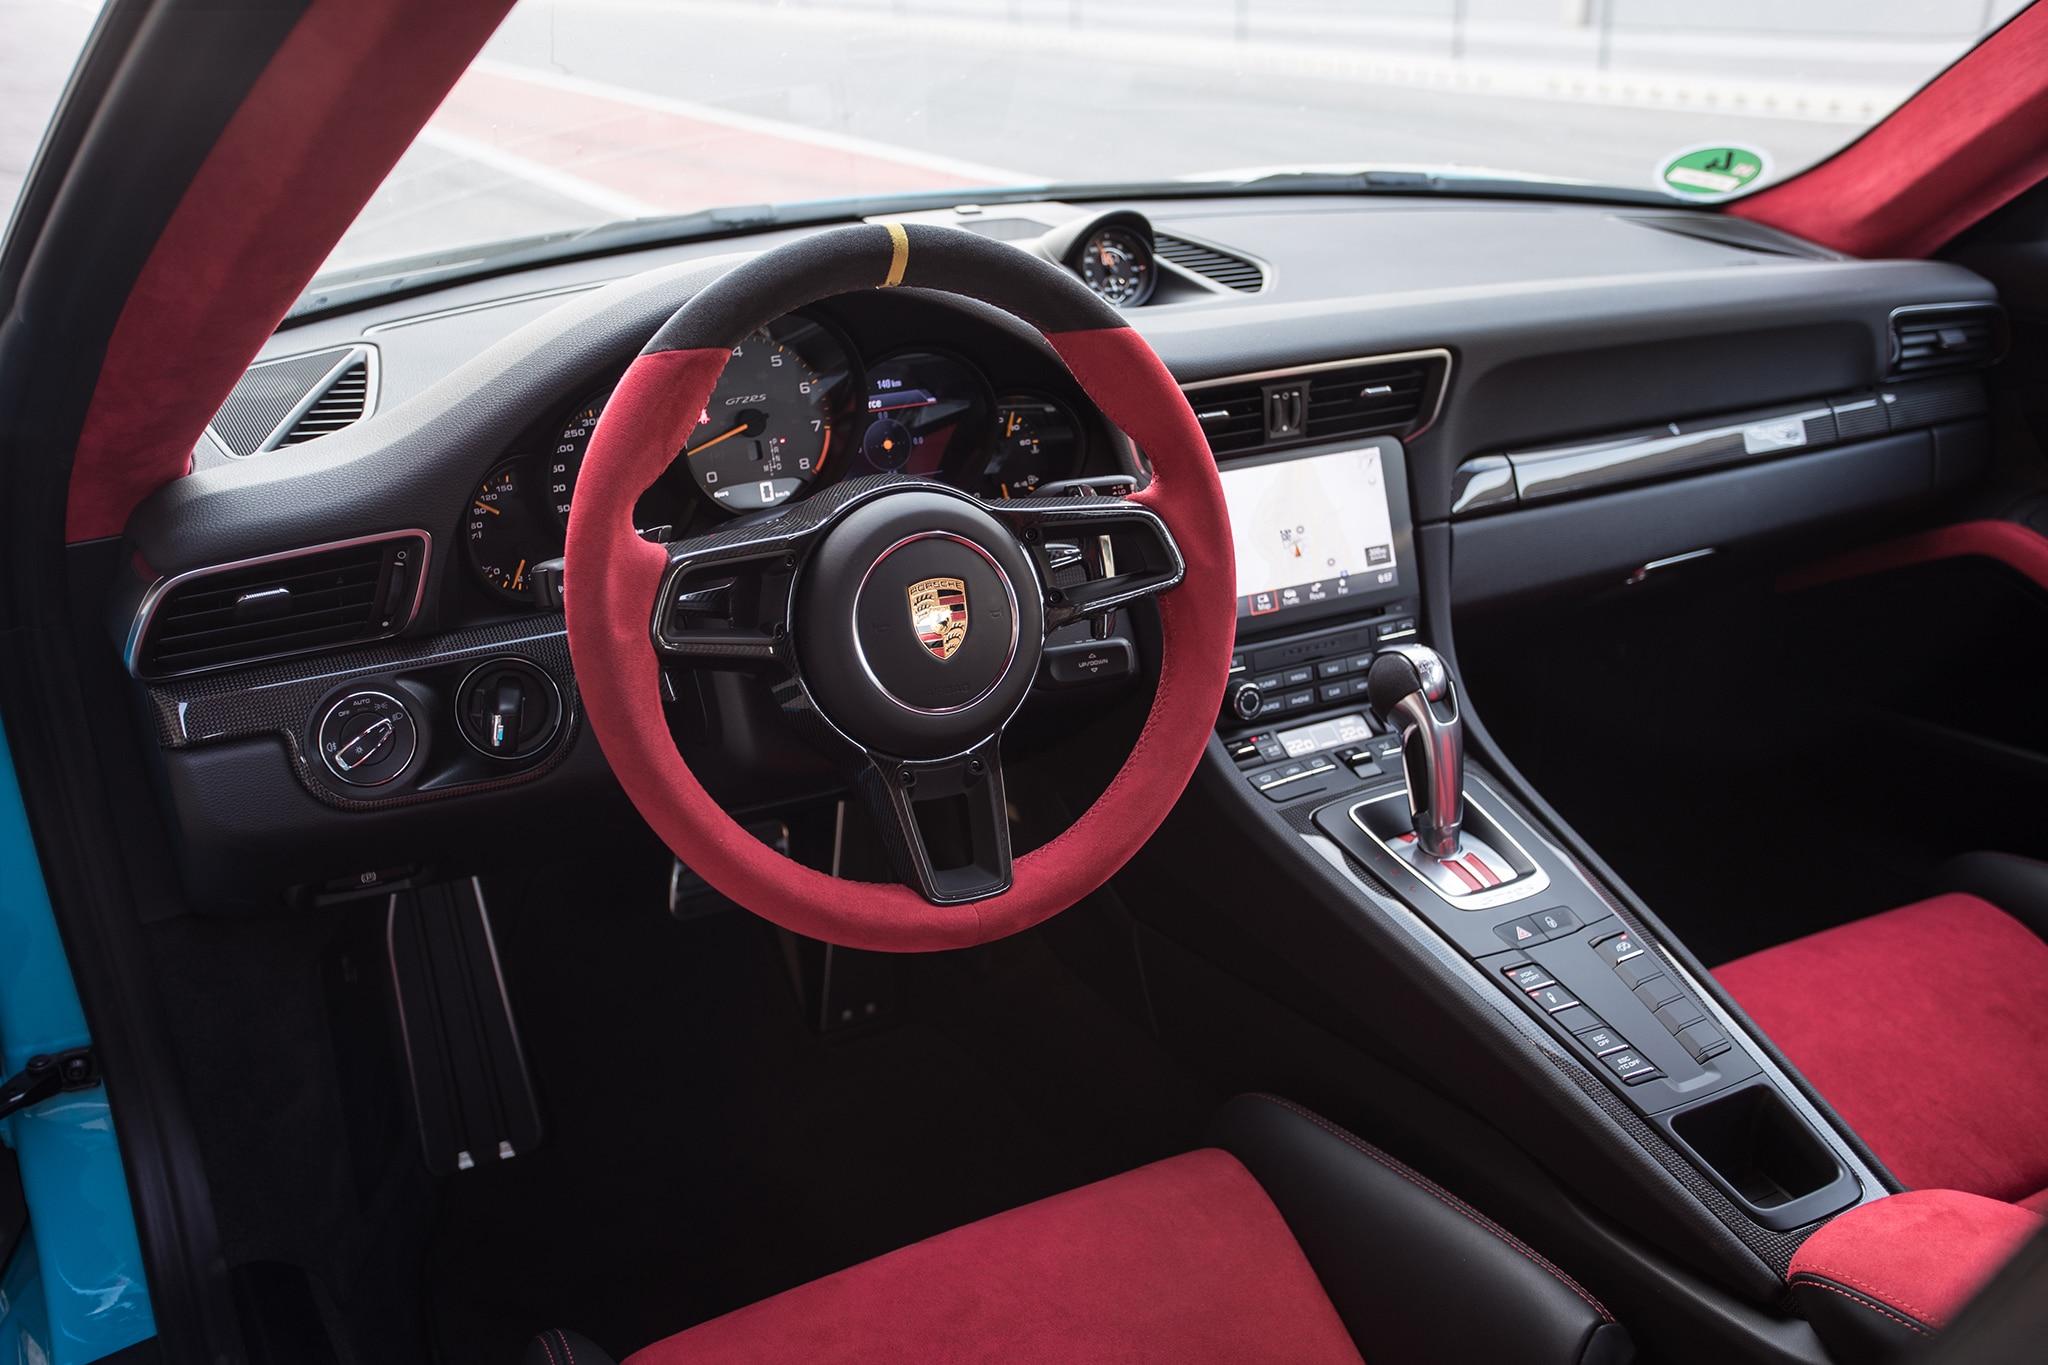 2018-Porsche-911-GT2-RS-cabin-07 Wonderful Porsche 911 Gt2 Wheel for Sale Cars Trend